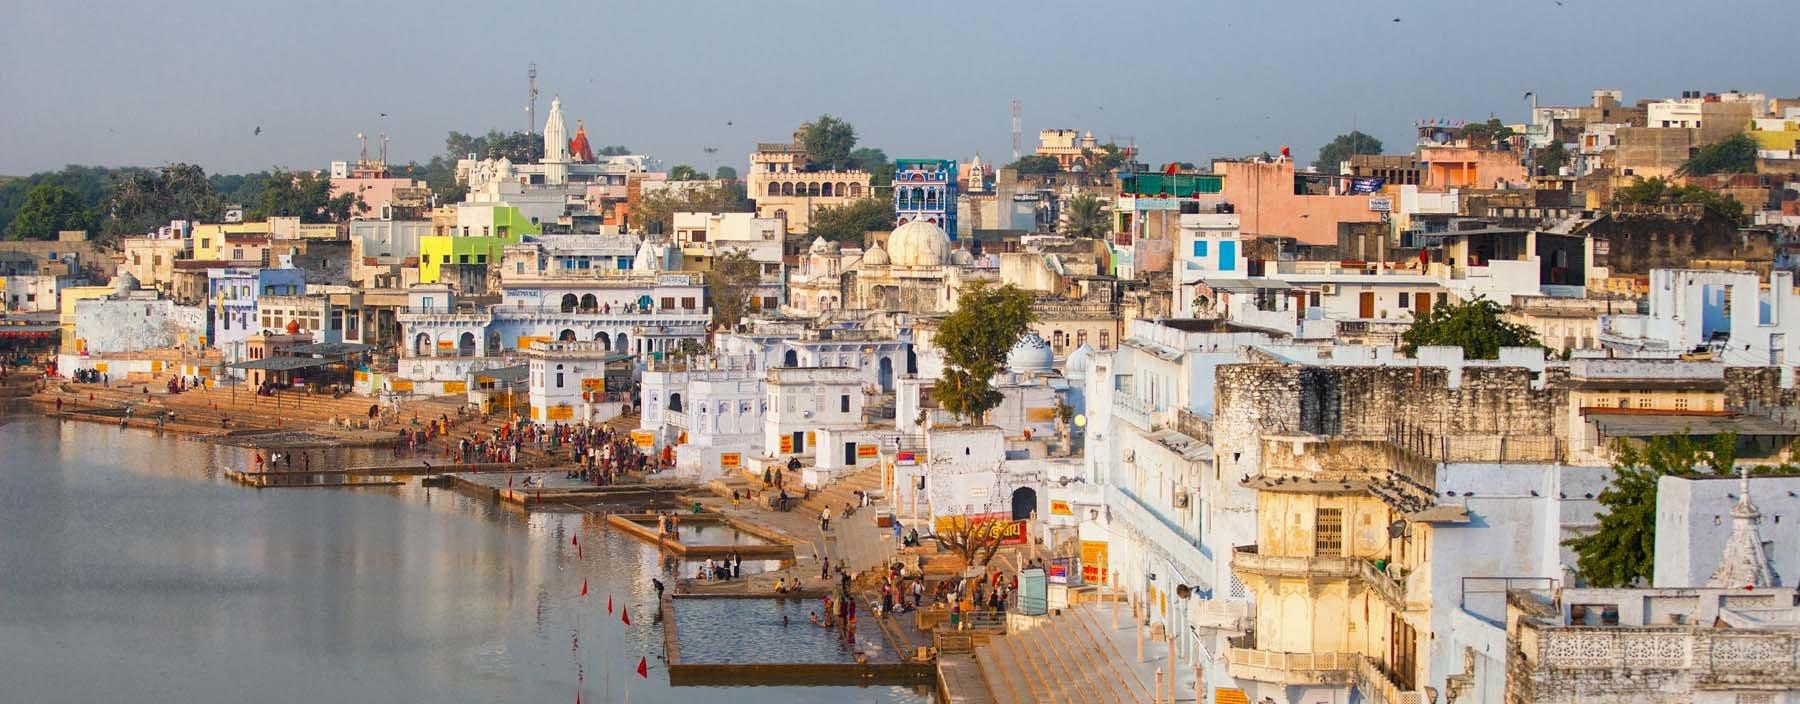 in, pushkar, city and the sacred lake..jpg